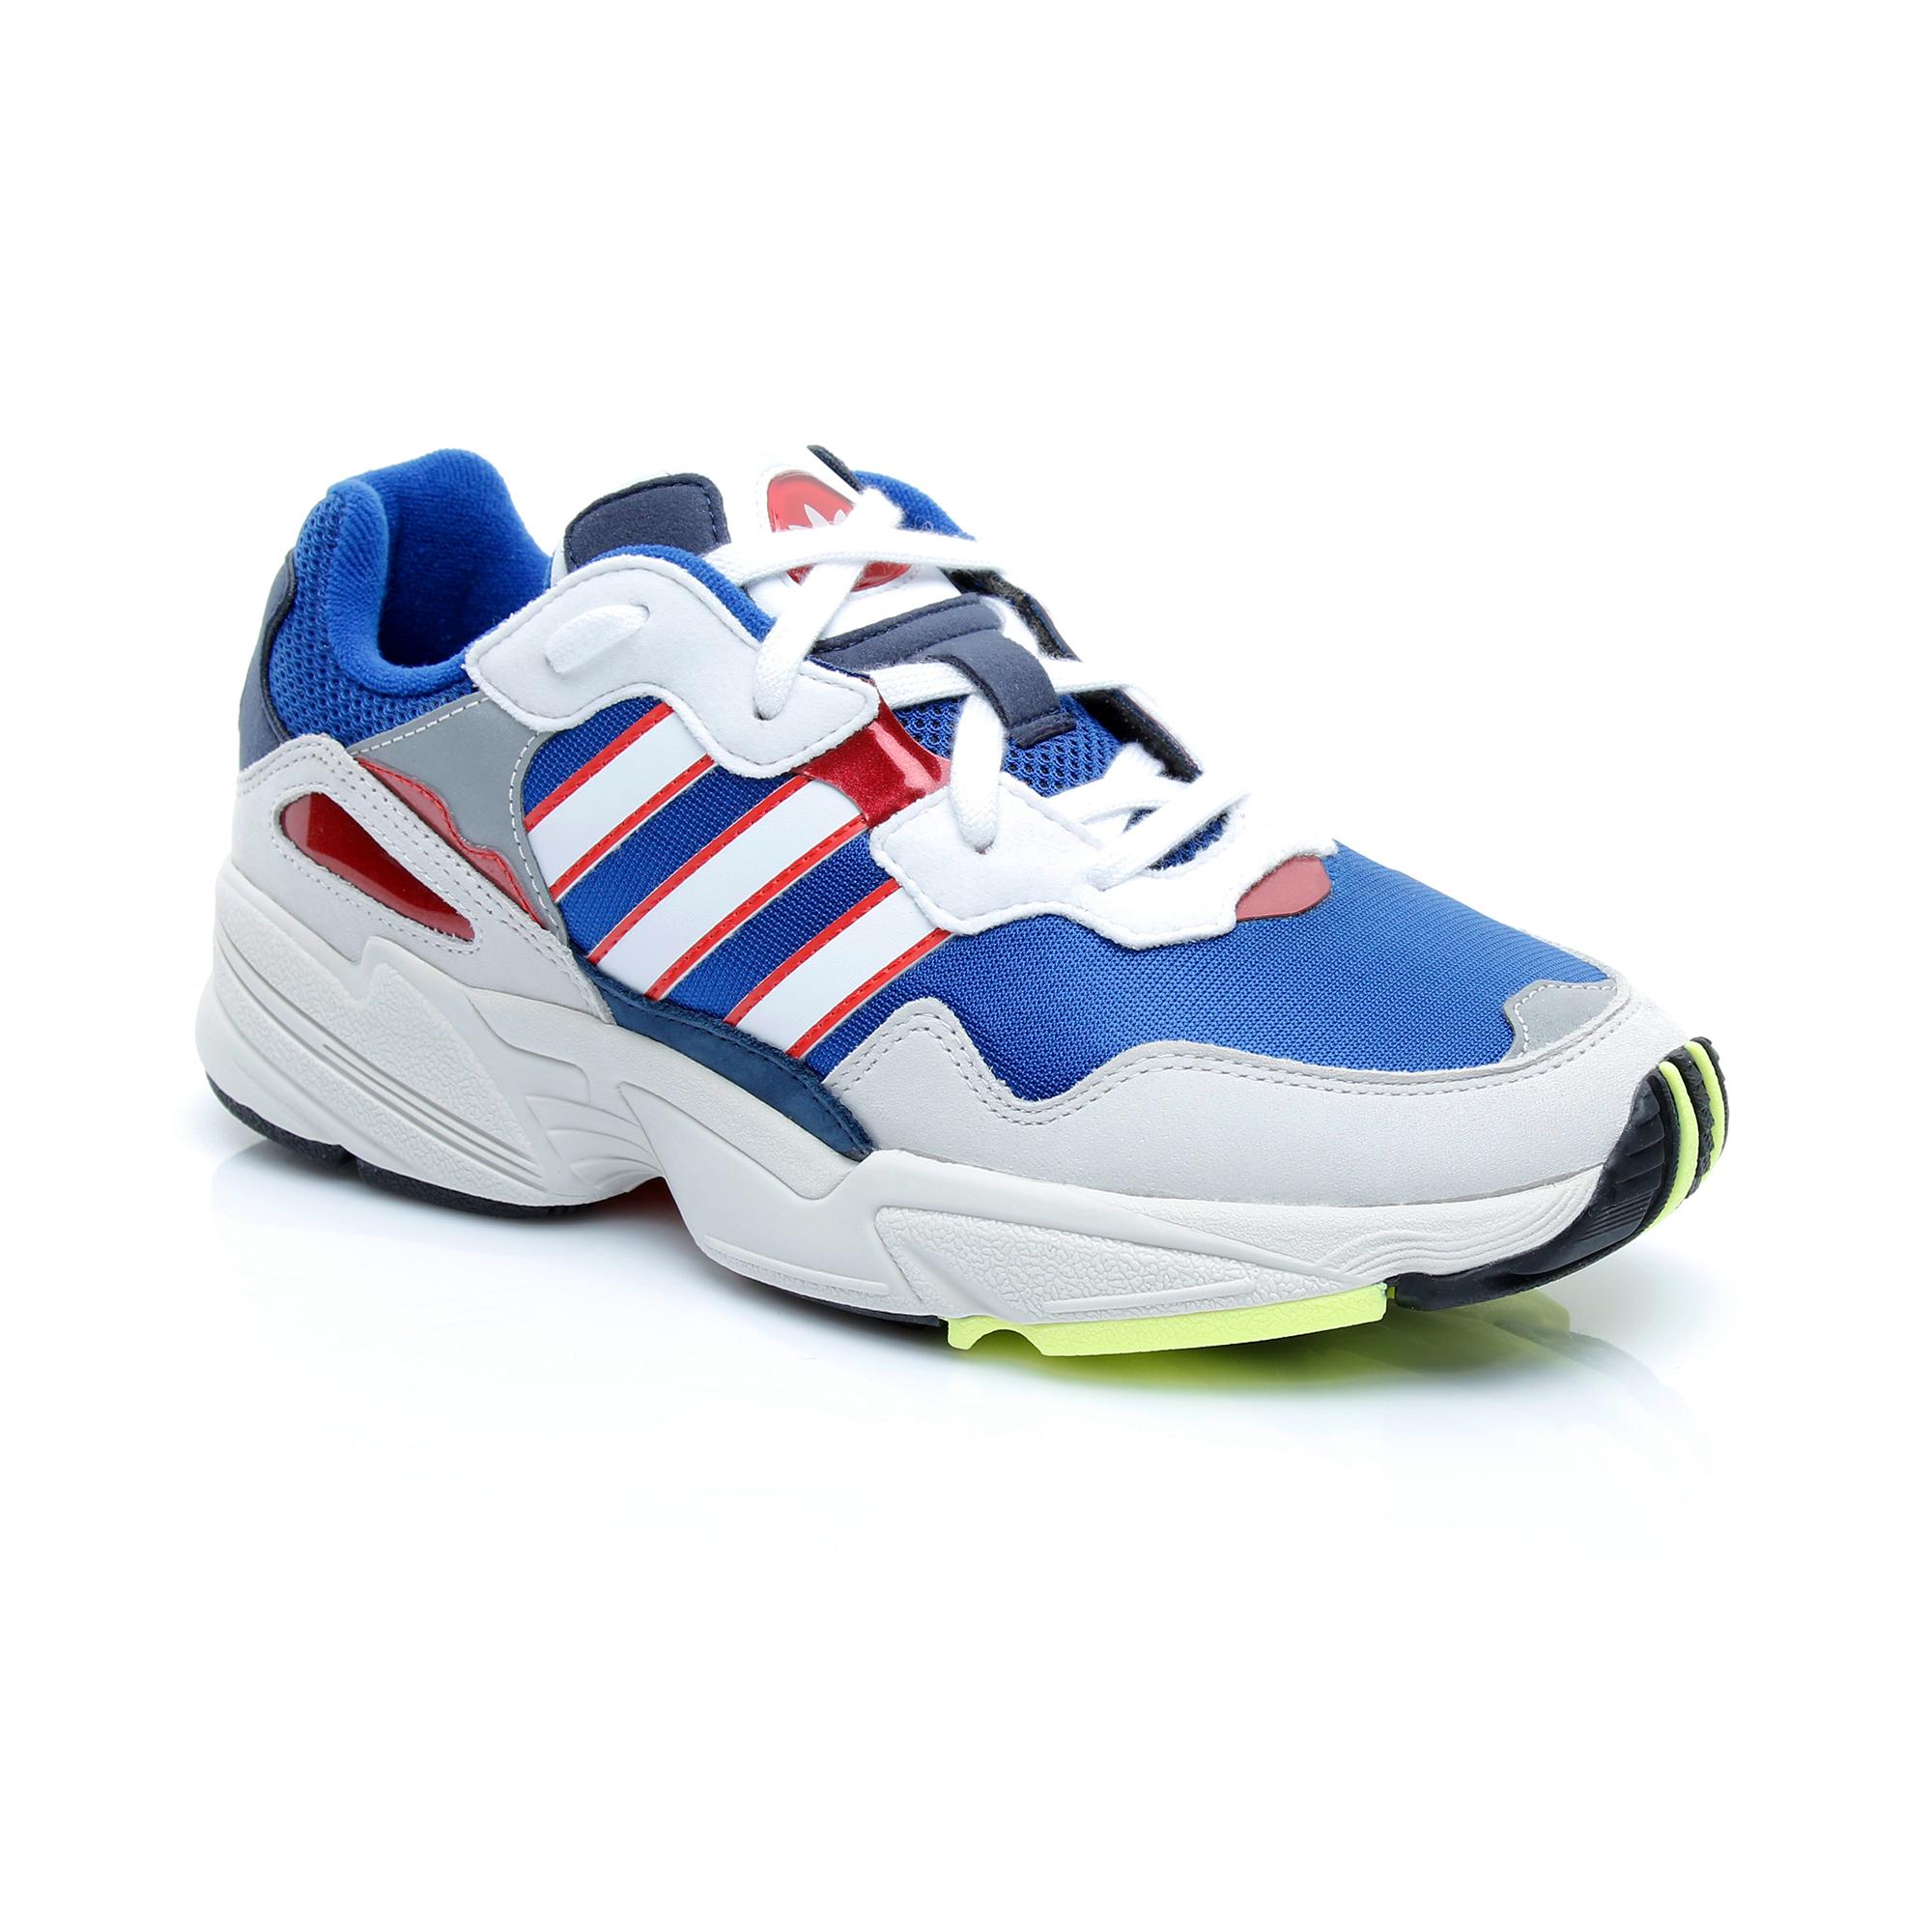 adidas Originals Yung-96 Erkek Beyaz-Mavi Spor Ayakkabı